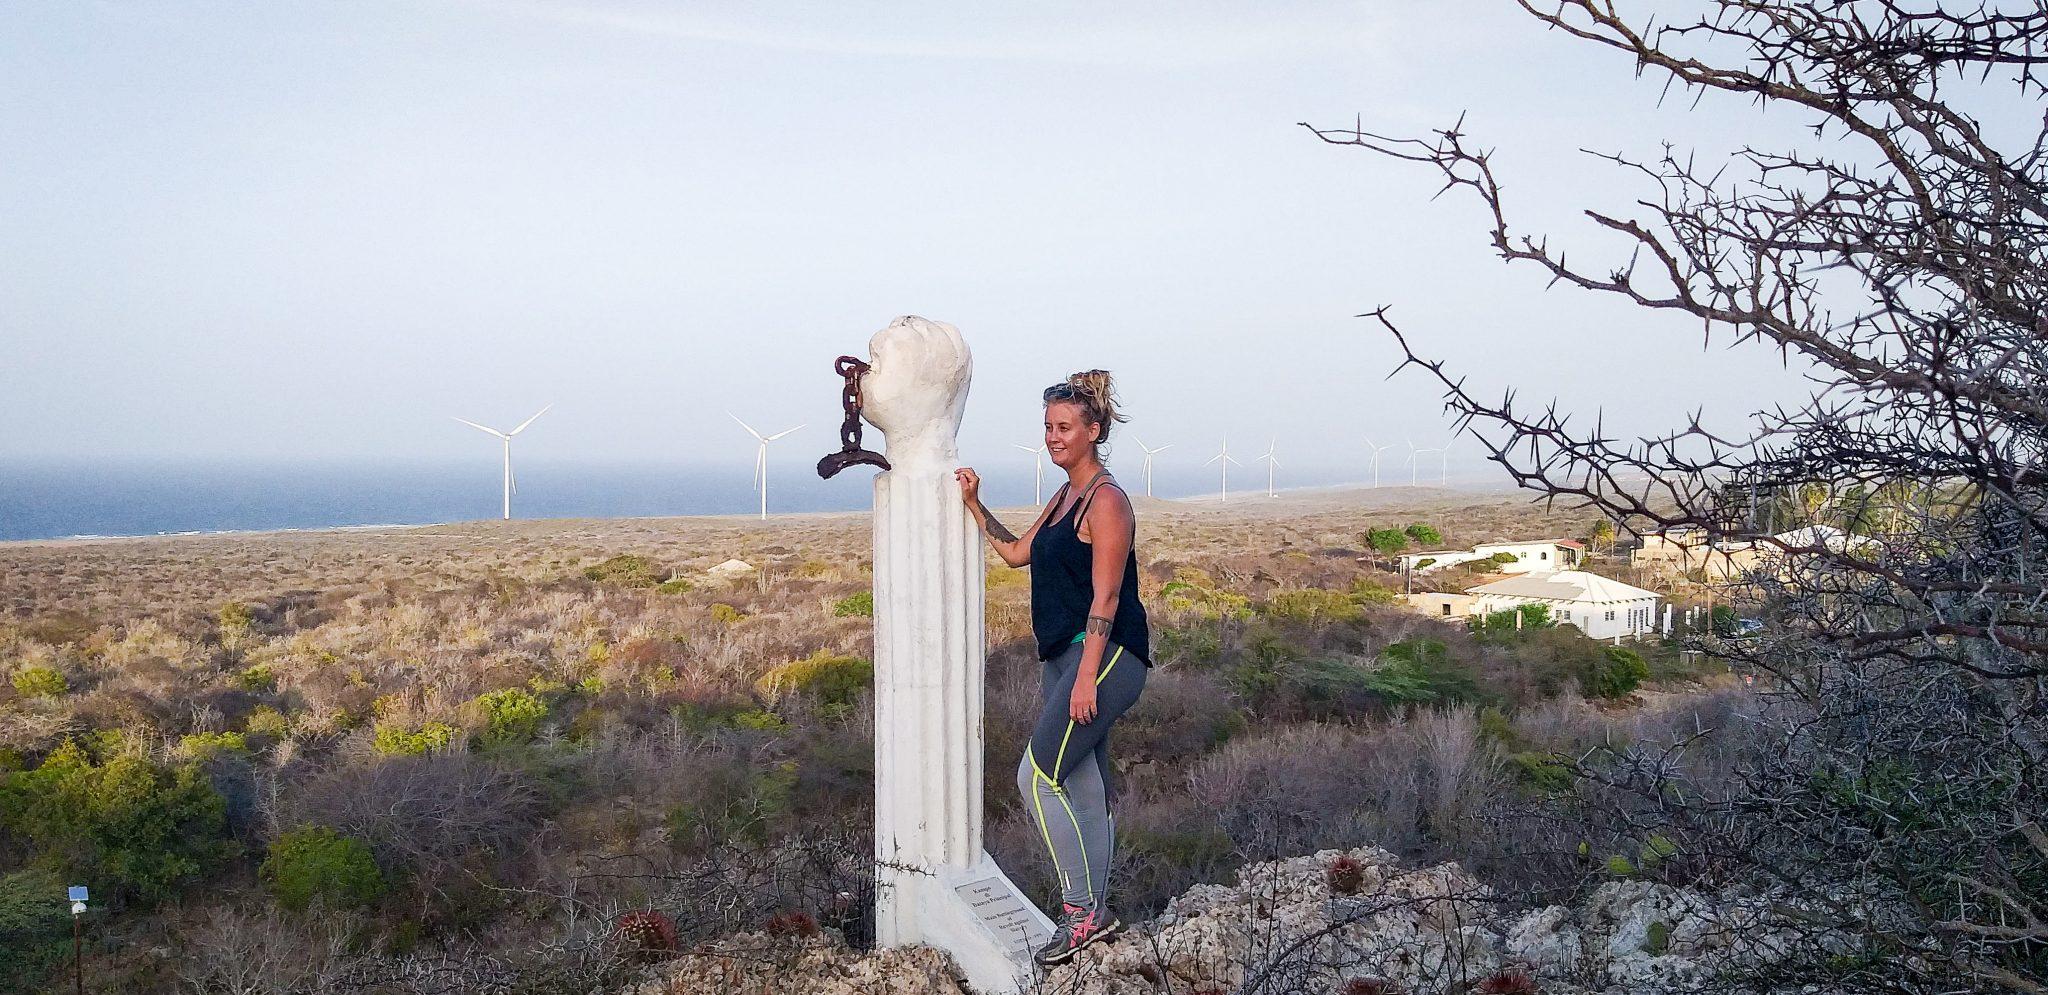 tula monument Curacao | Slavernij verleden Curacao